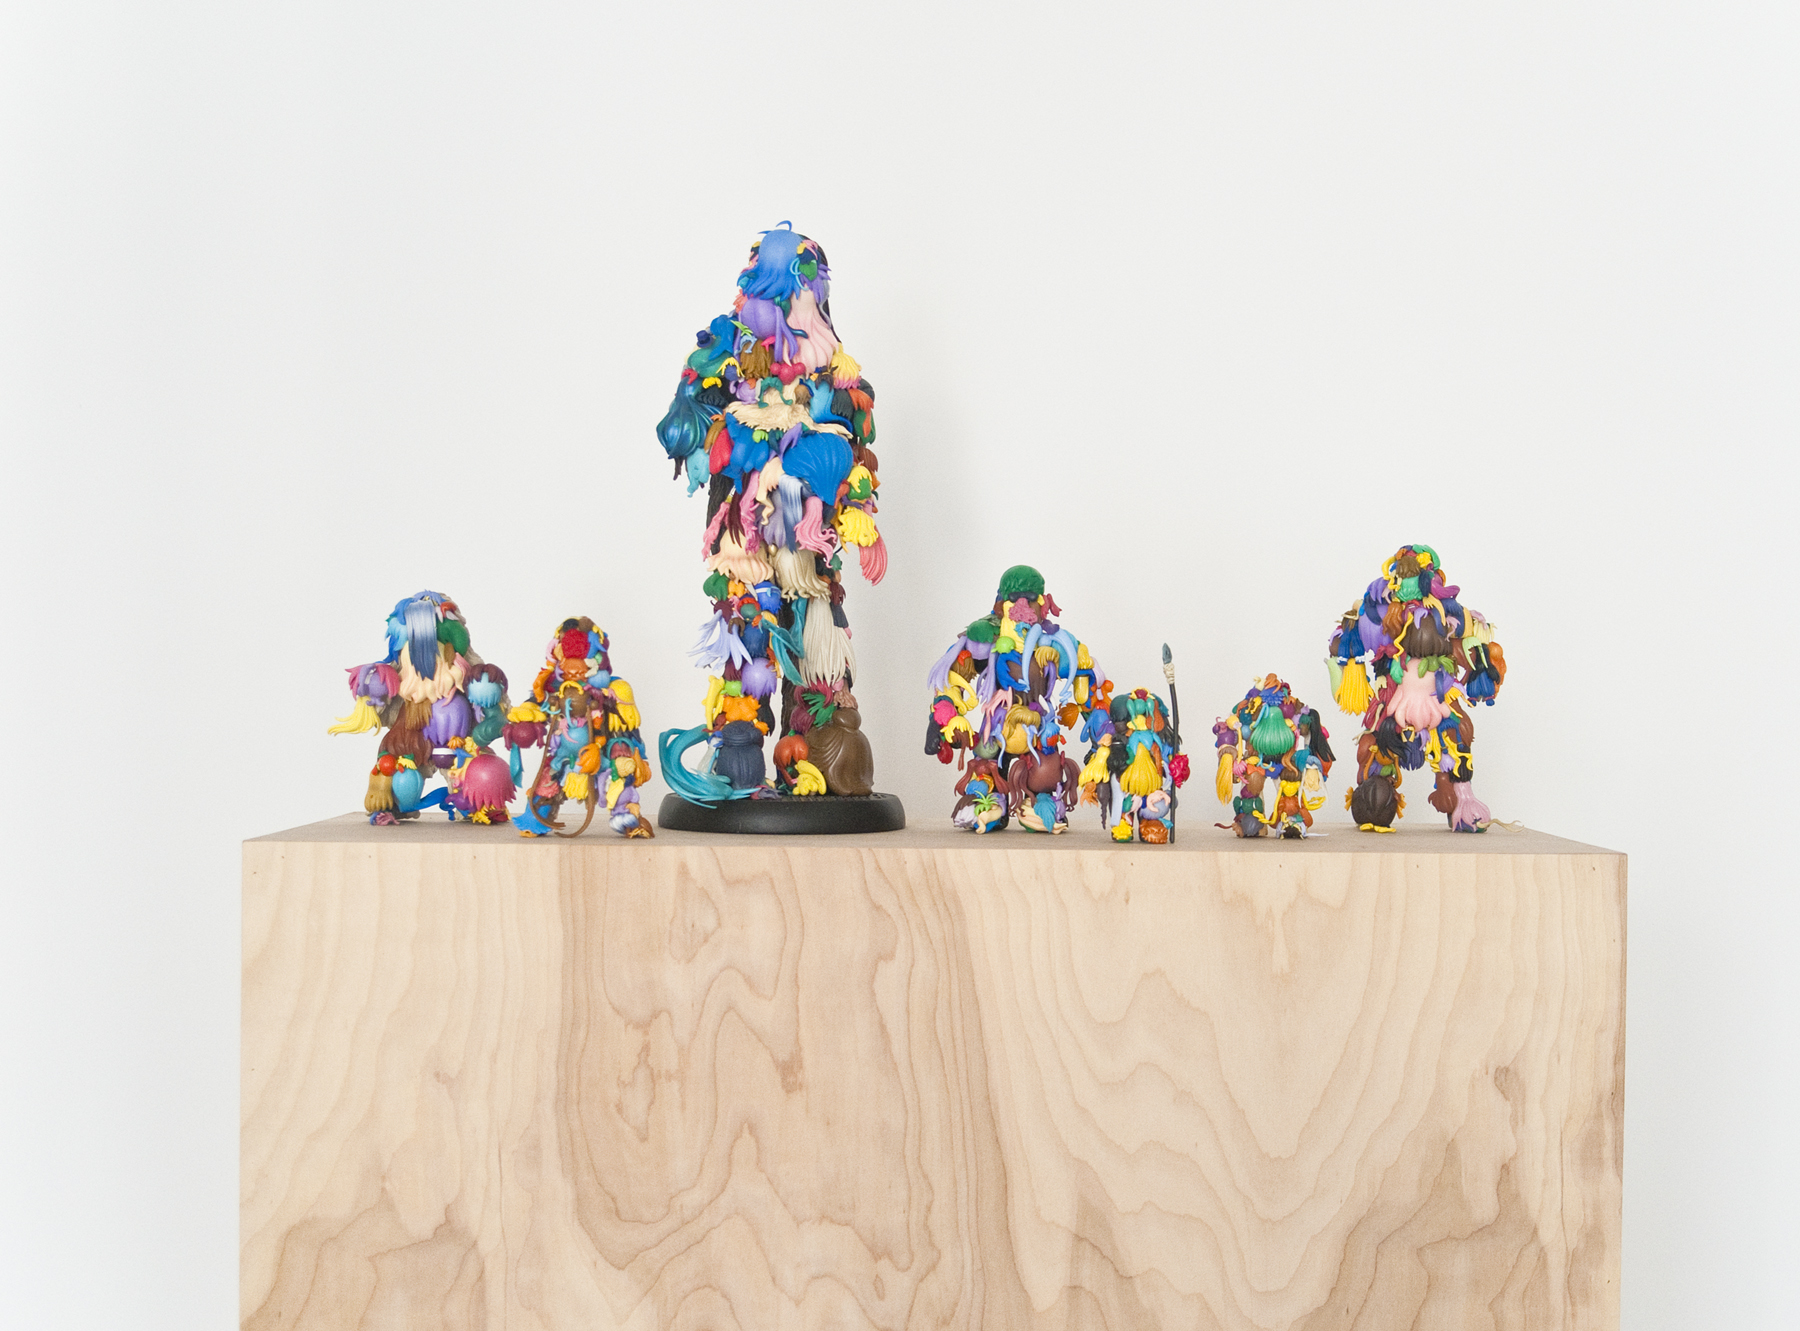 Teppei Kaneuji   Teenage Fan Club #66-#72 , 2015 plastic figures, hot glue dimensions variable